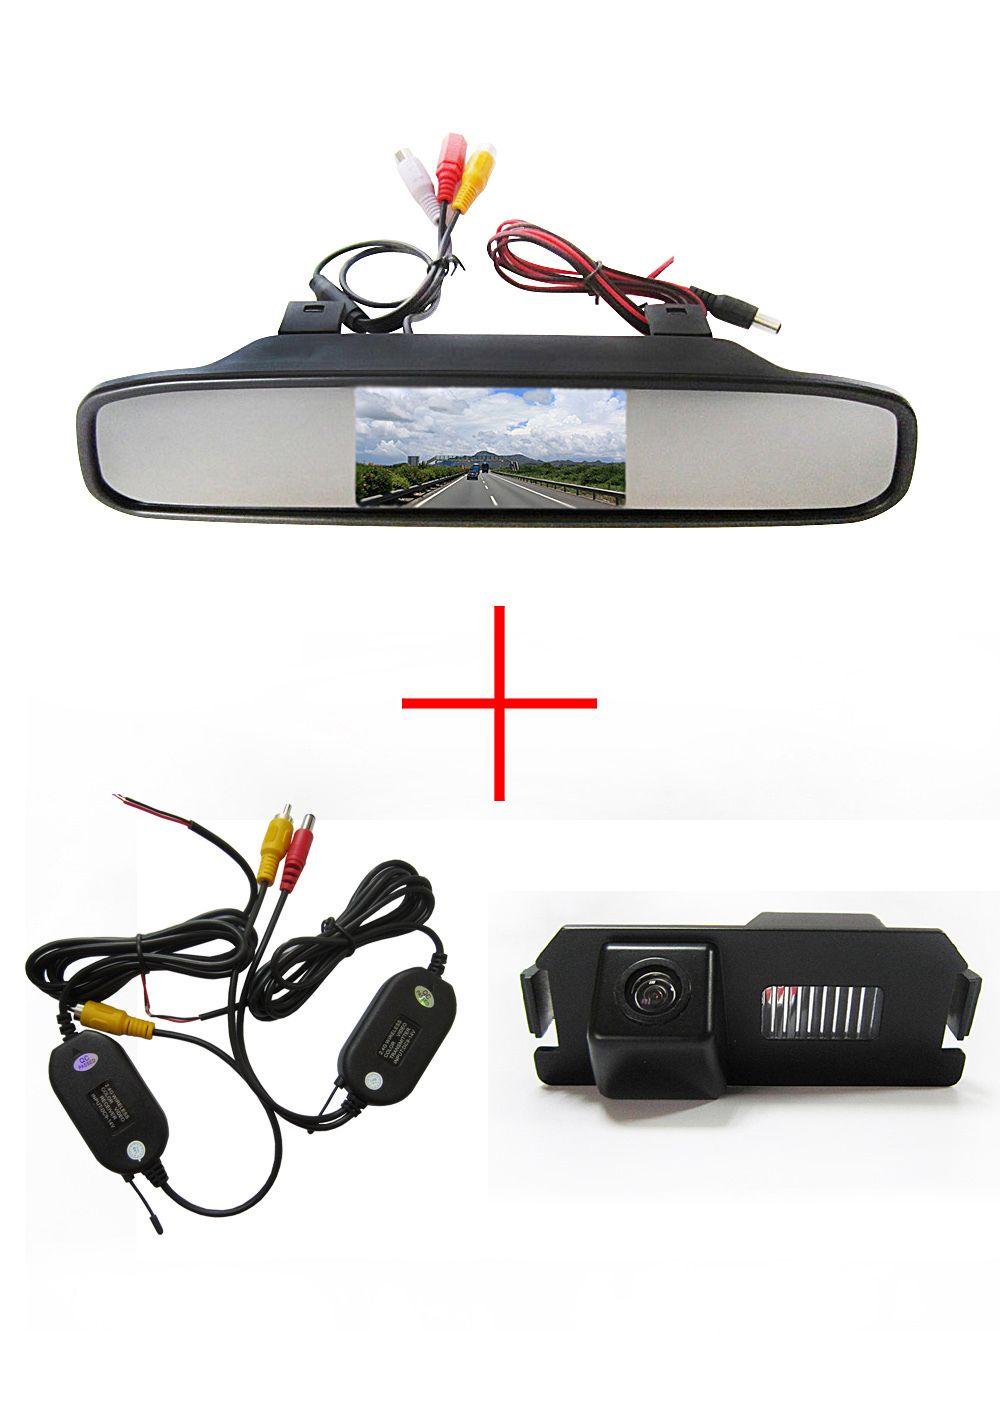 Wireless Wifi Ccd Car Rear View Camera For Hyundai I30 Genesis Coupe Tiburon Kia Soul With 4 3 Inch Rear Vie Reverse Camera For Car Rear View Camera Car Camera